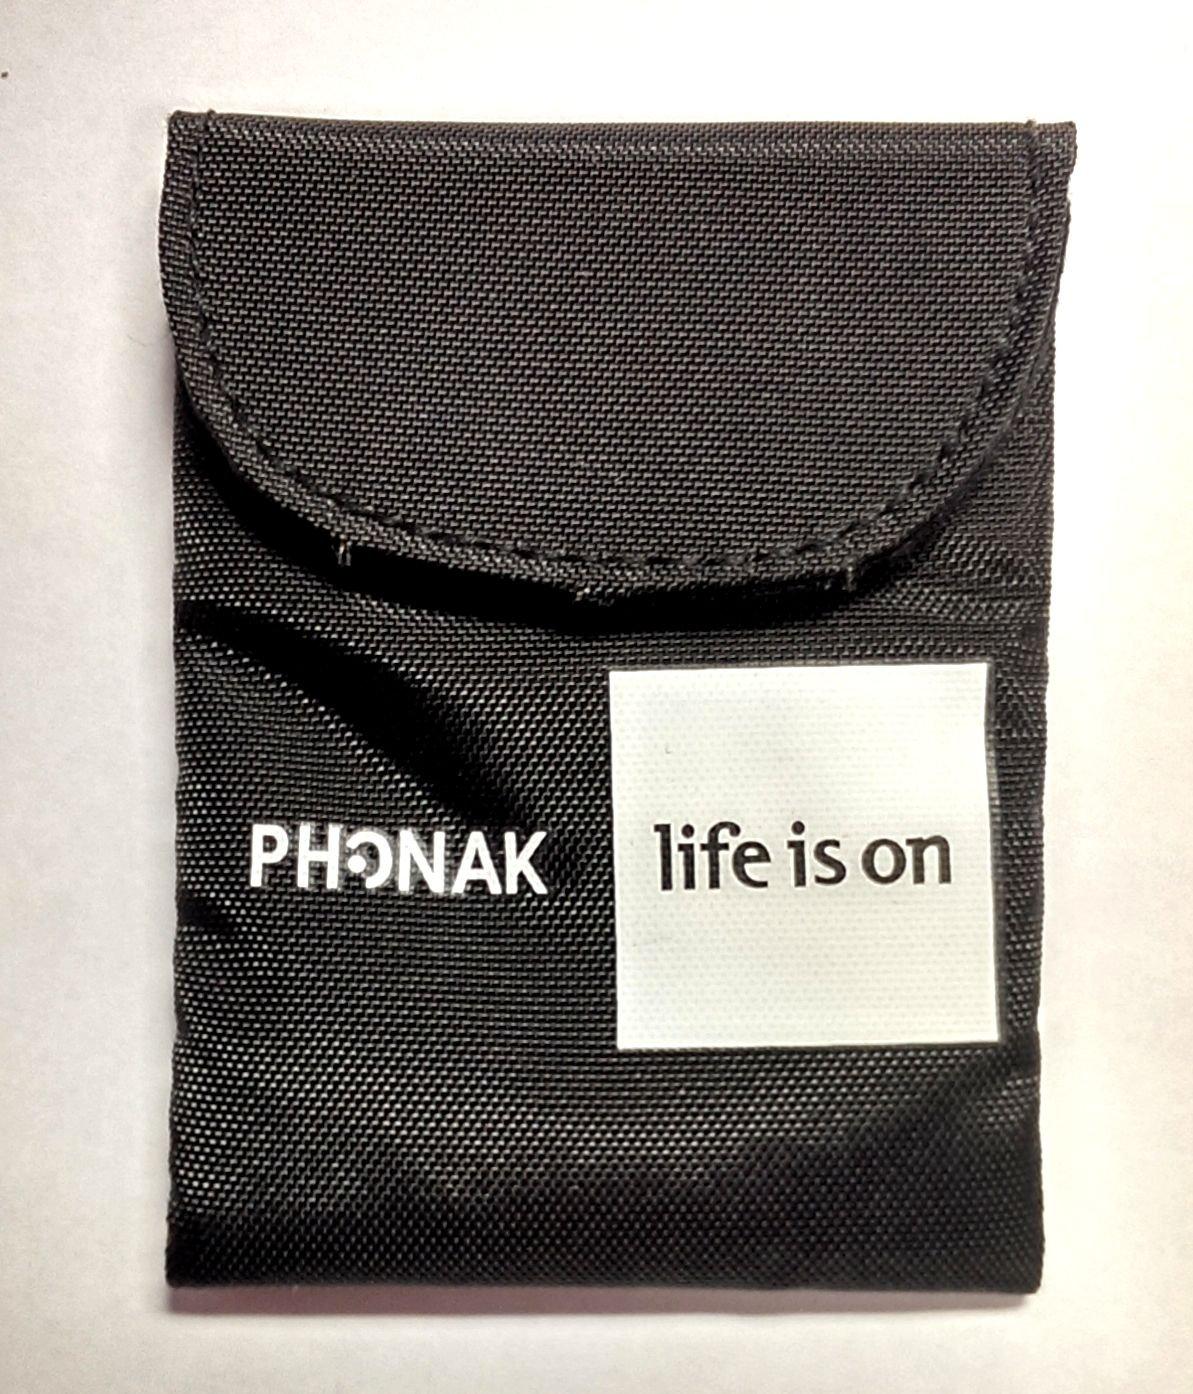 Amazon.com: Original Phonak Hearing Aid Pouch: Health & Personal Care